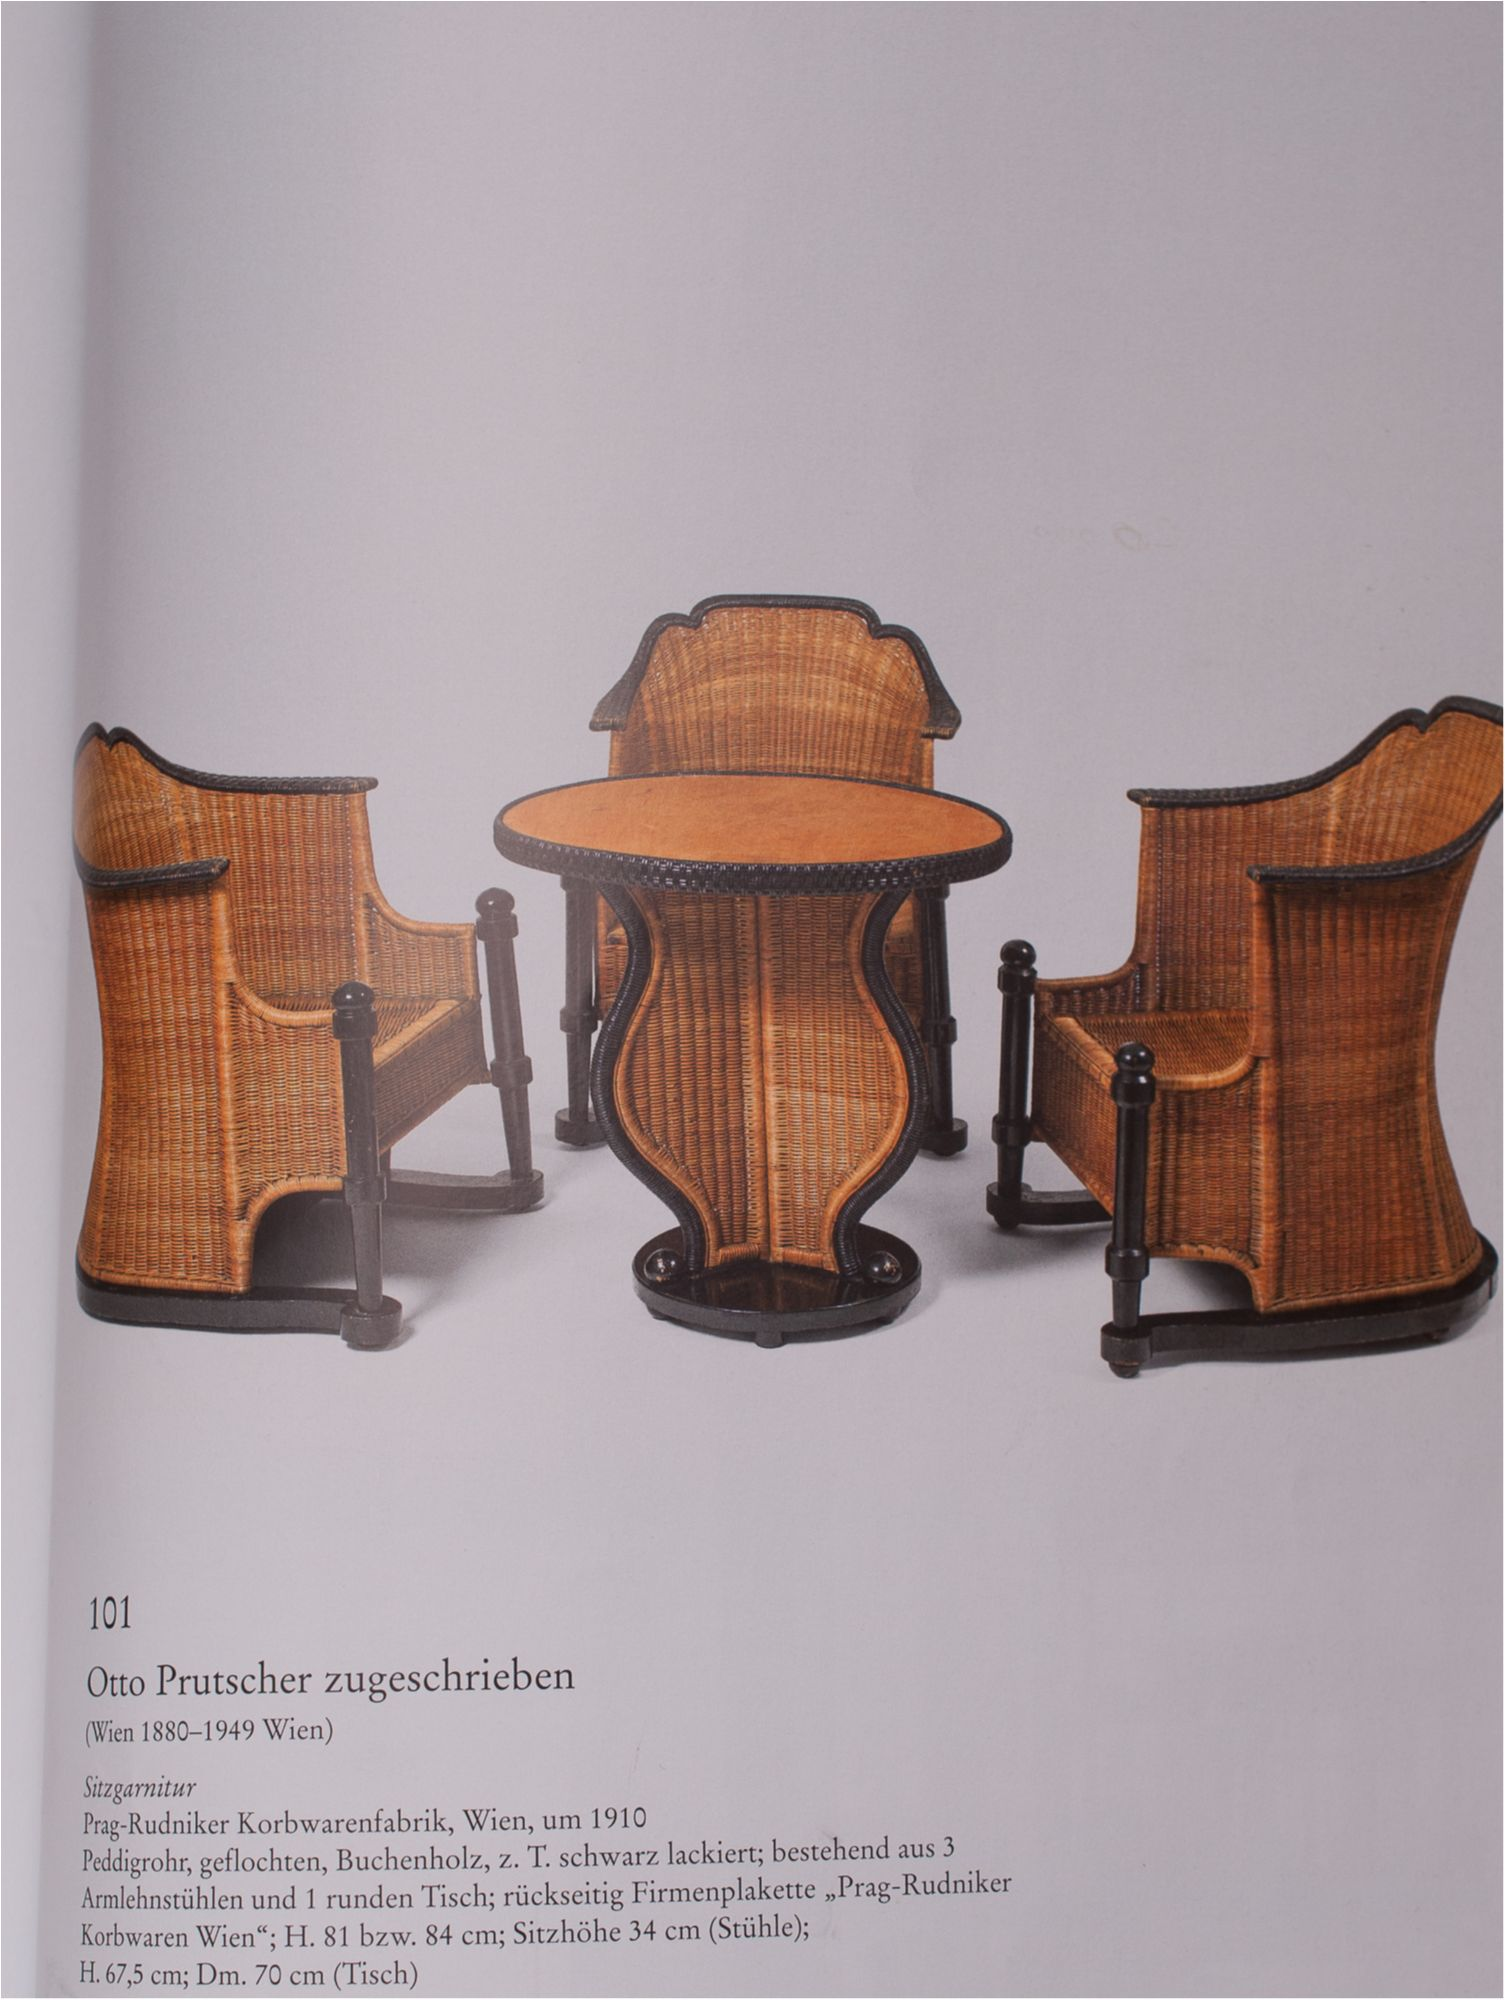 Otto mbel tisch affordable otto mobel kuche best art for Home affaire mobel gebraucht